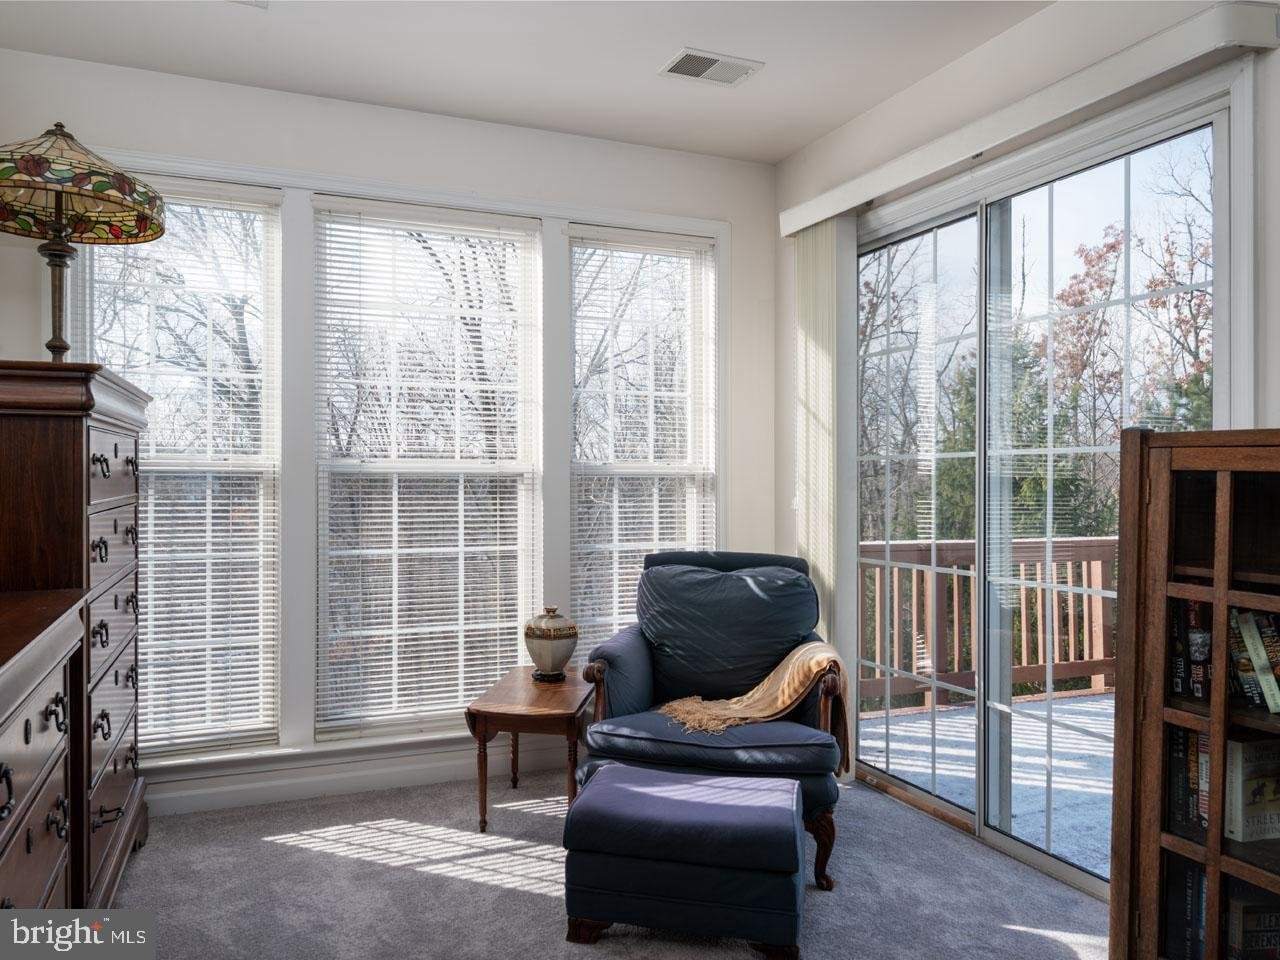 VAFX1104336-302201657719-2021-07-16-19-45-25  |   | Alexandria Delaware Real Estate For Sale | MLS# Vafx1104336  - Best of Northern Virginia